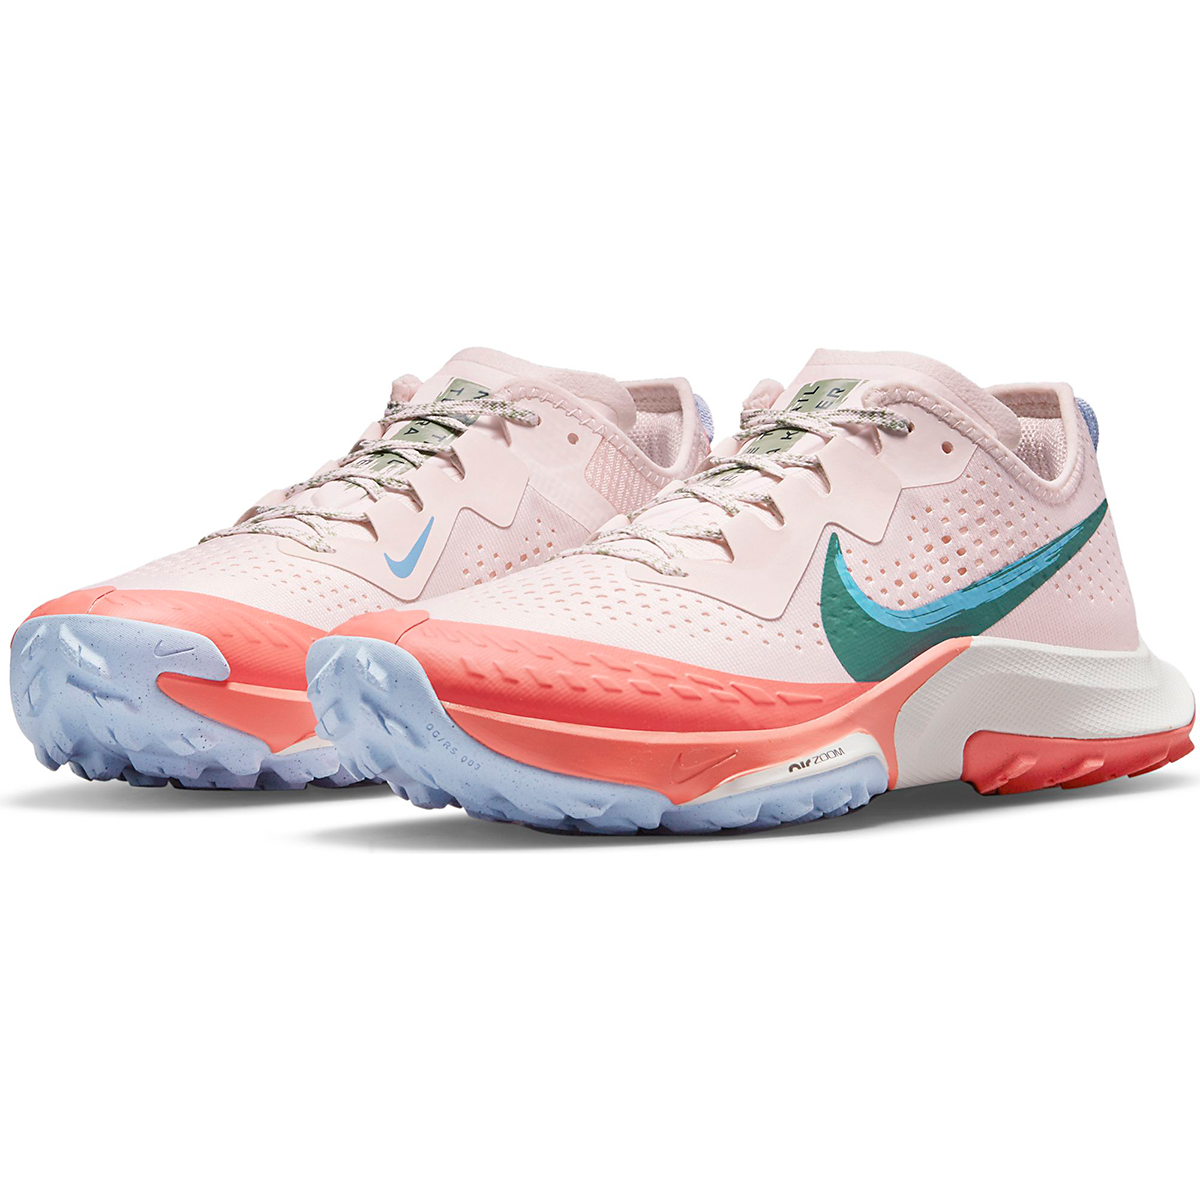 Women's Nike Air Zoom Terra Kiger 7 Trail Running Shoe - Color: Light Soft Pink/Bicoastal/Magic Ember - Size: 5 - Width: Regular, Light Soft Pink/Bicoastal/Magic Ember, large, image 5